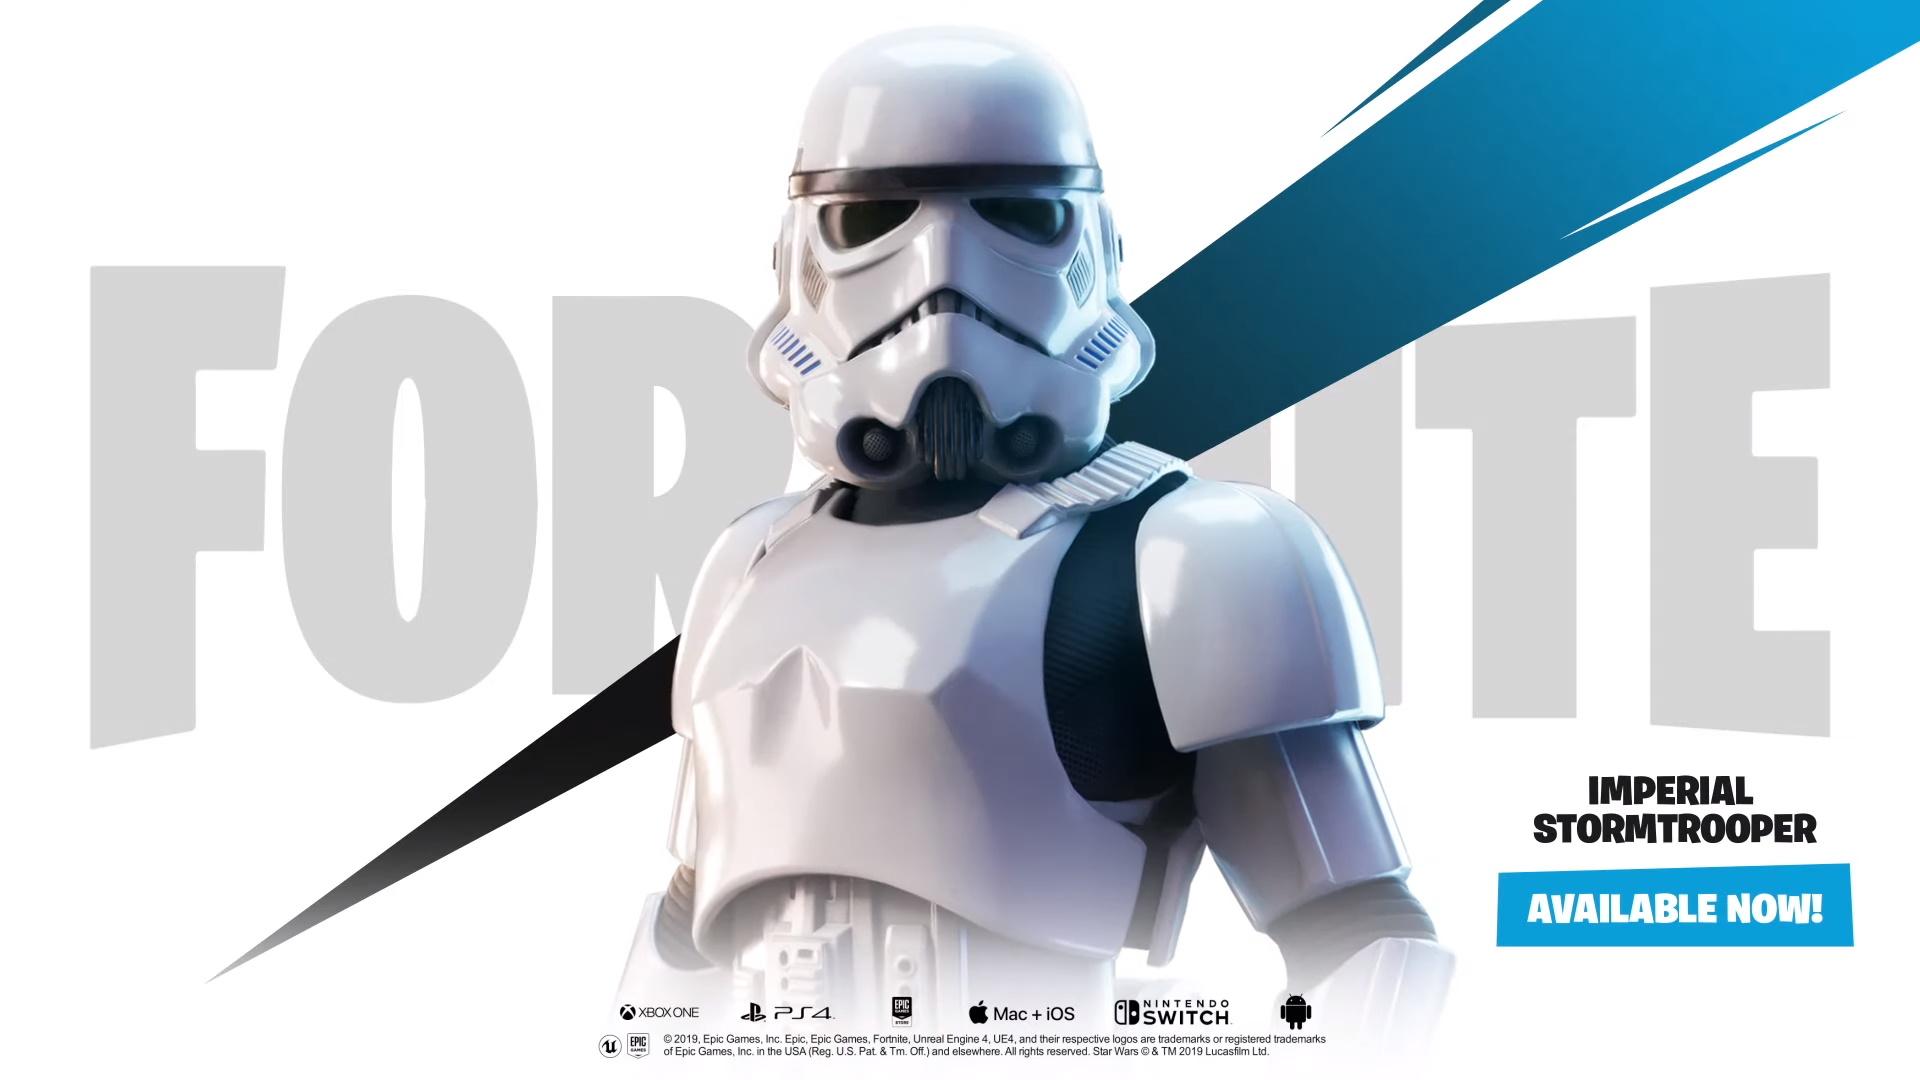 Fortnite X Star Wars Event Kicks Off With A Stormtrooper Skin And A Star Destroyer Gamesradar